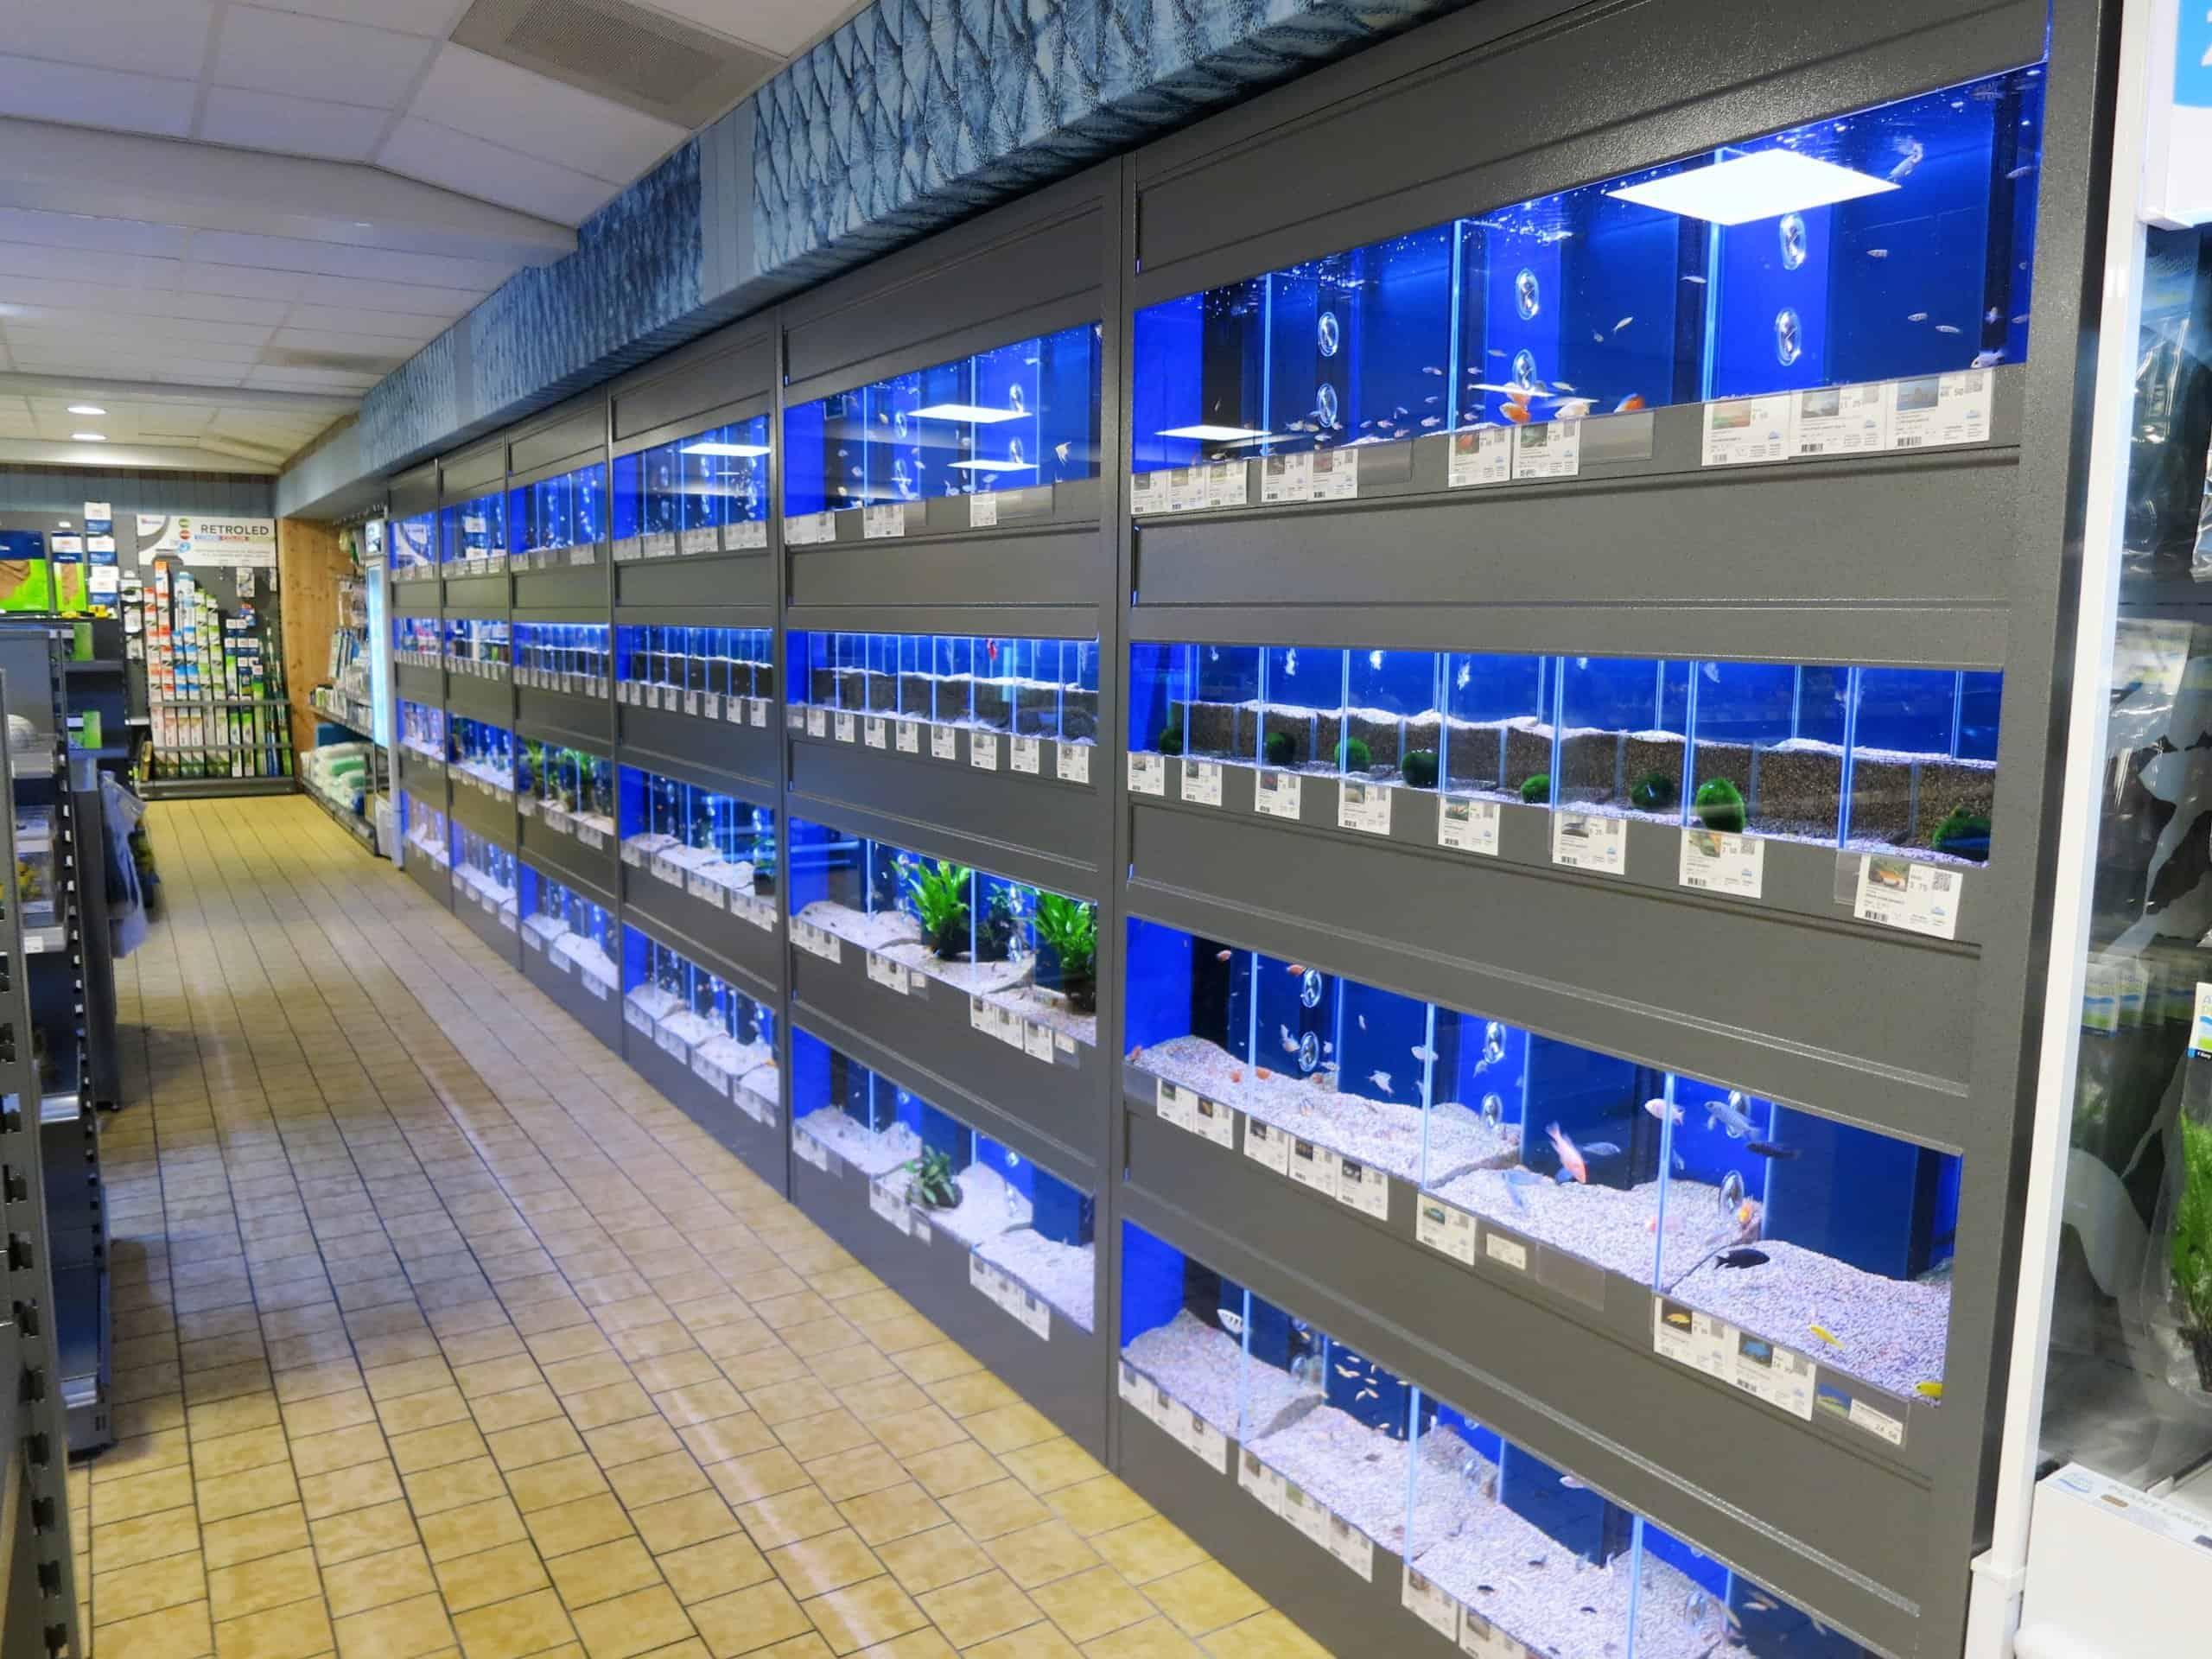 aquarium stelling a-serie met kleppen